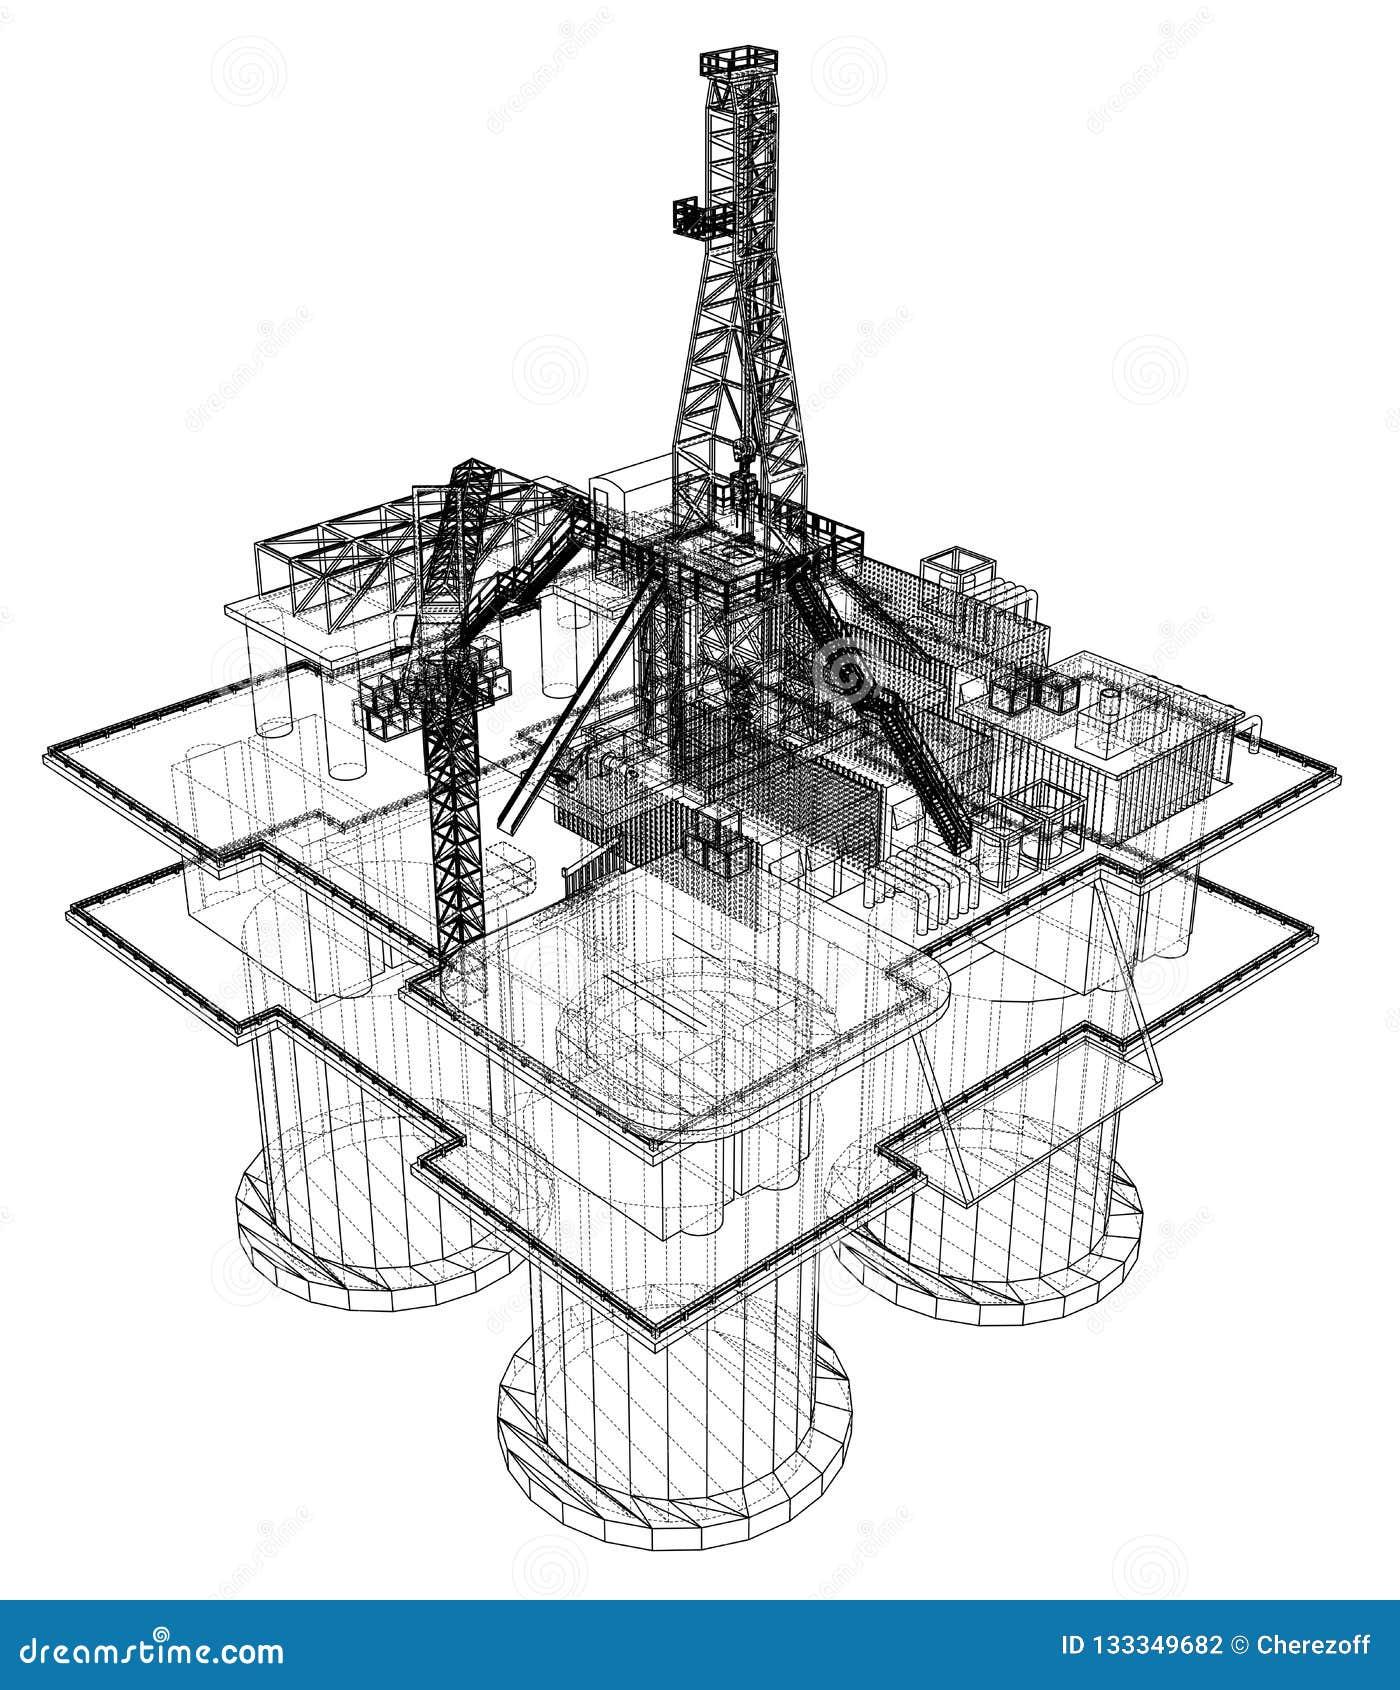 Offs Oil Rig Drilling Platform Concept Stock ... Ocean Drilling Rig Schematic Diagram on